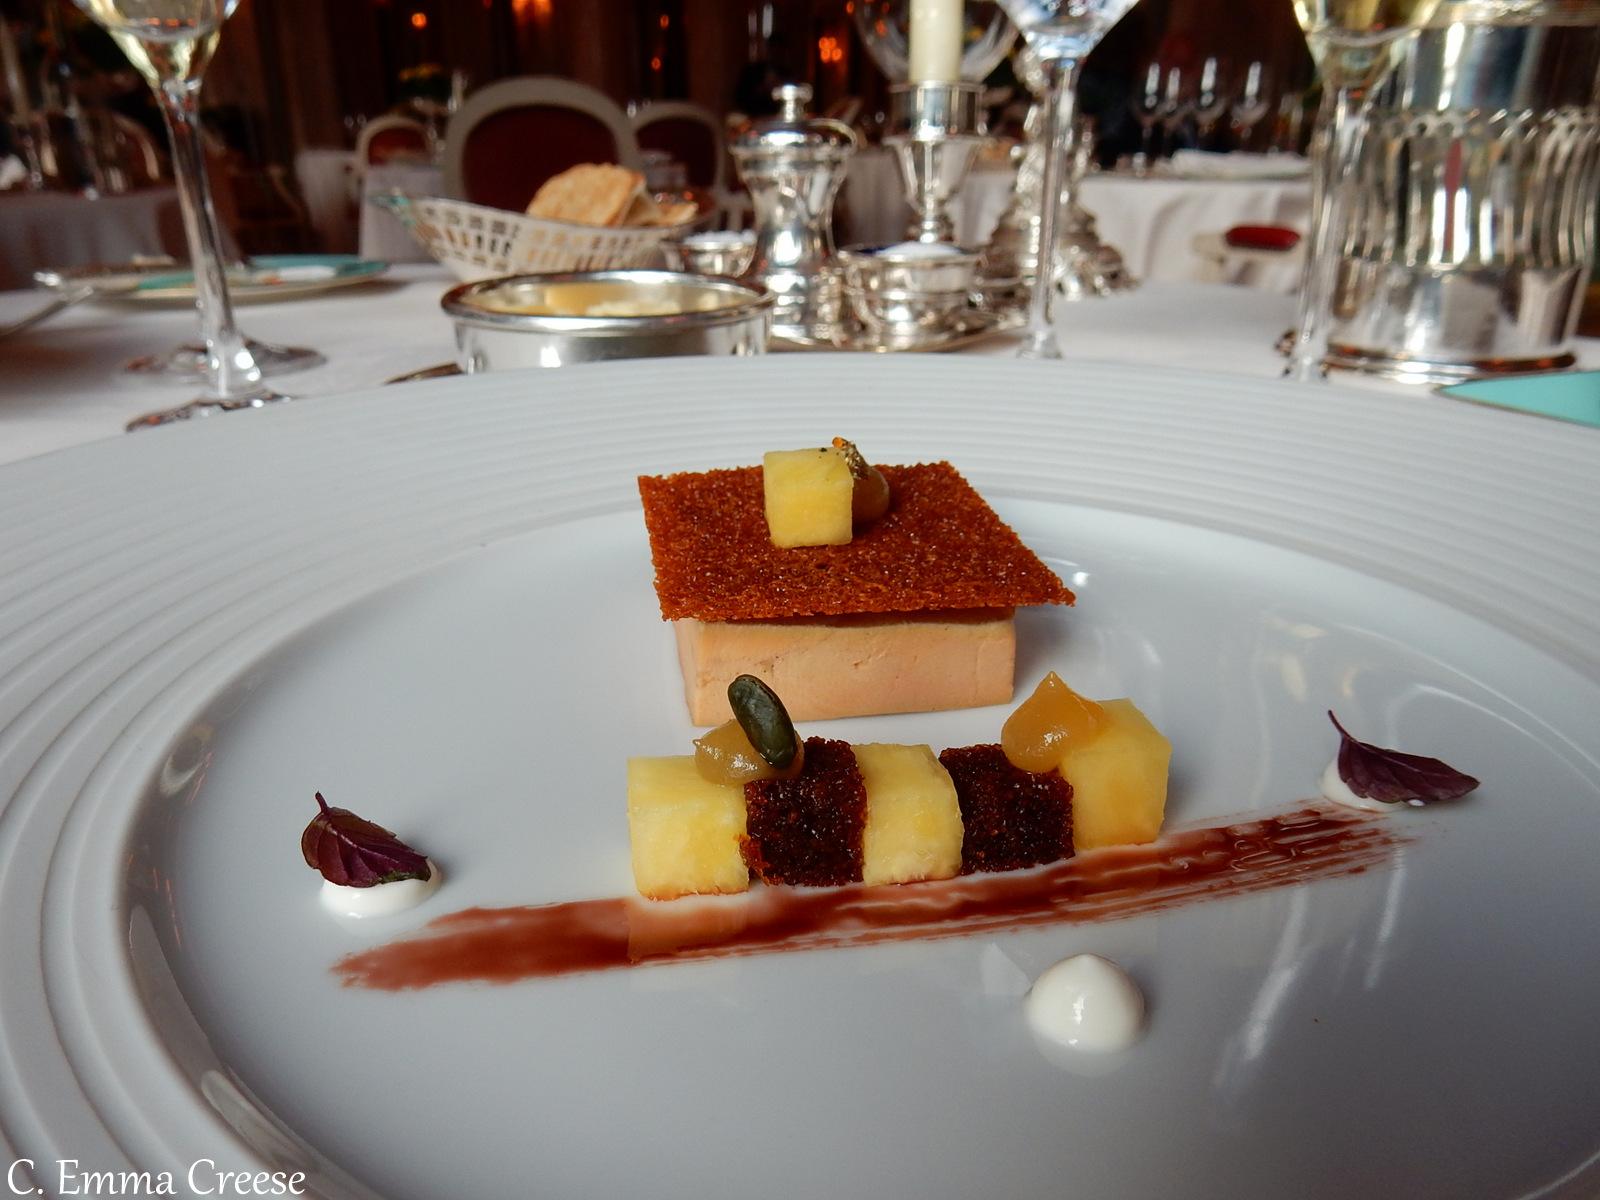 Luxury London Restaurant Review The Ritz Adventures of a London Kiwi